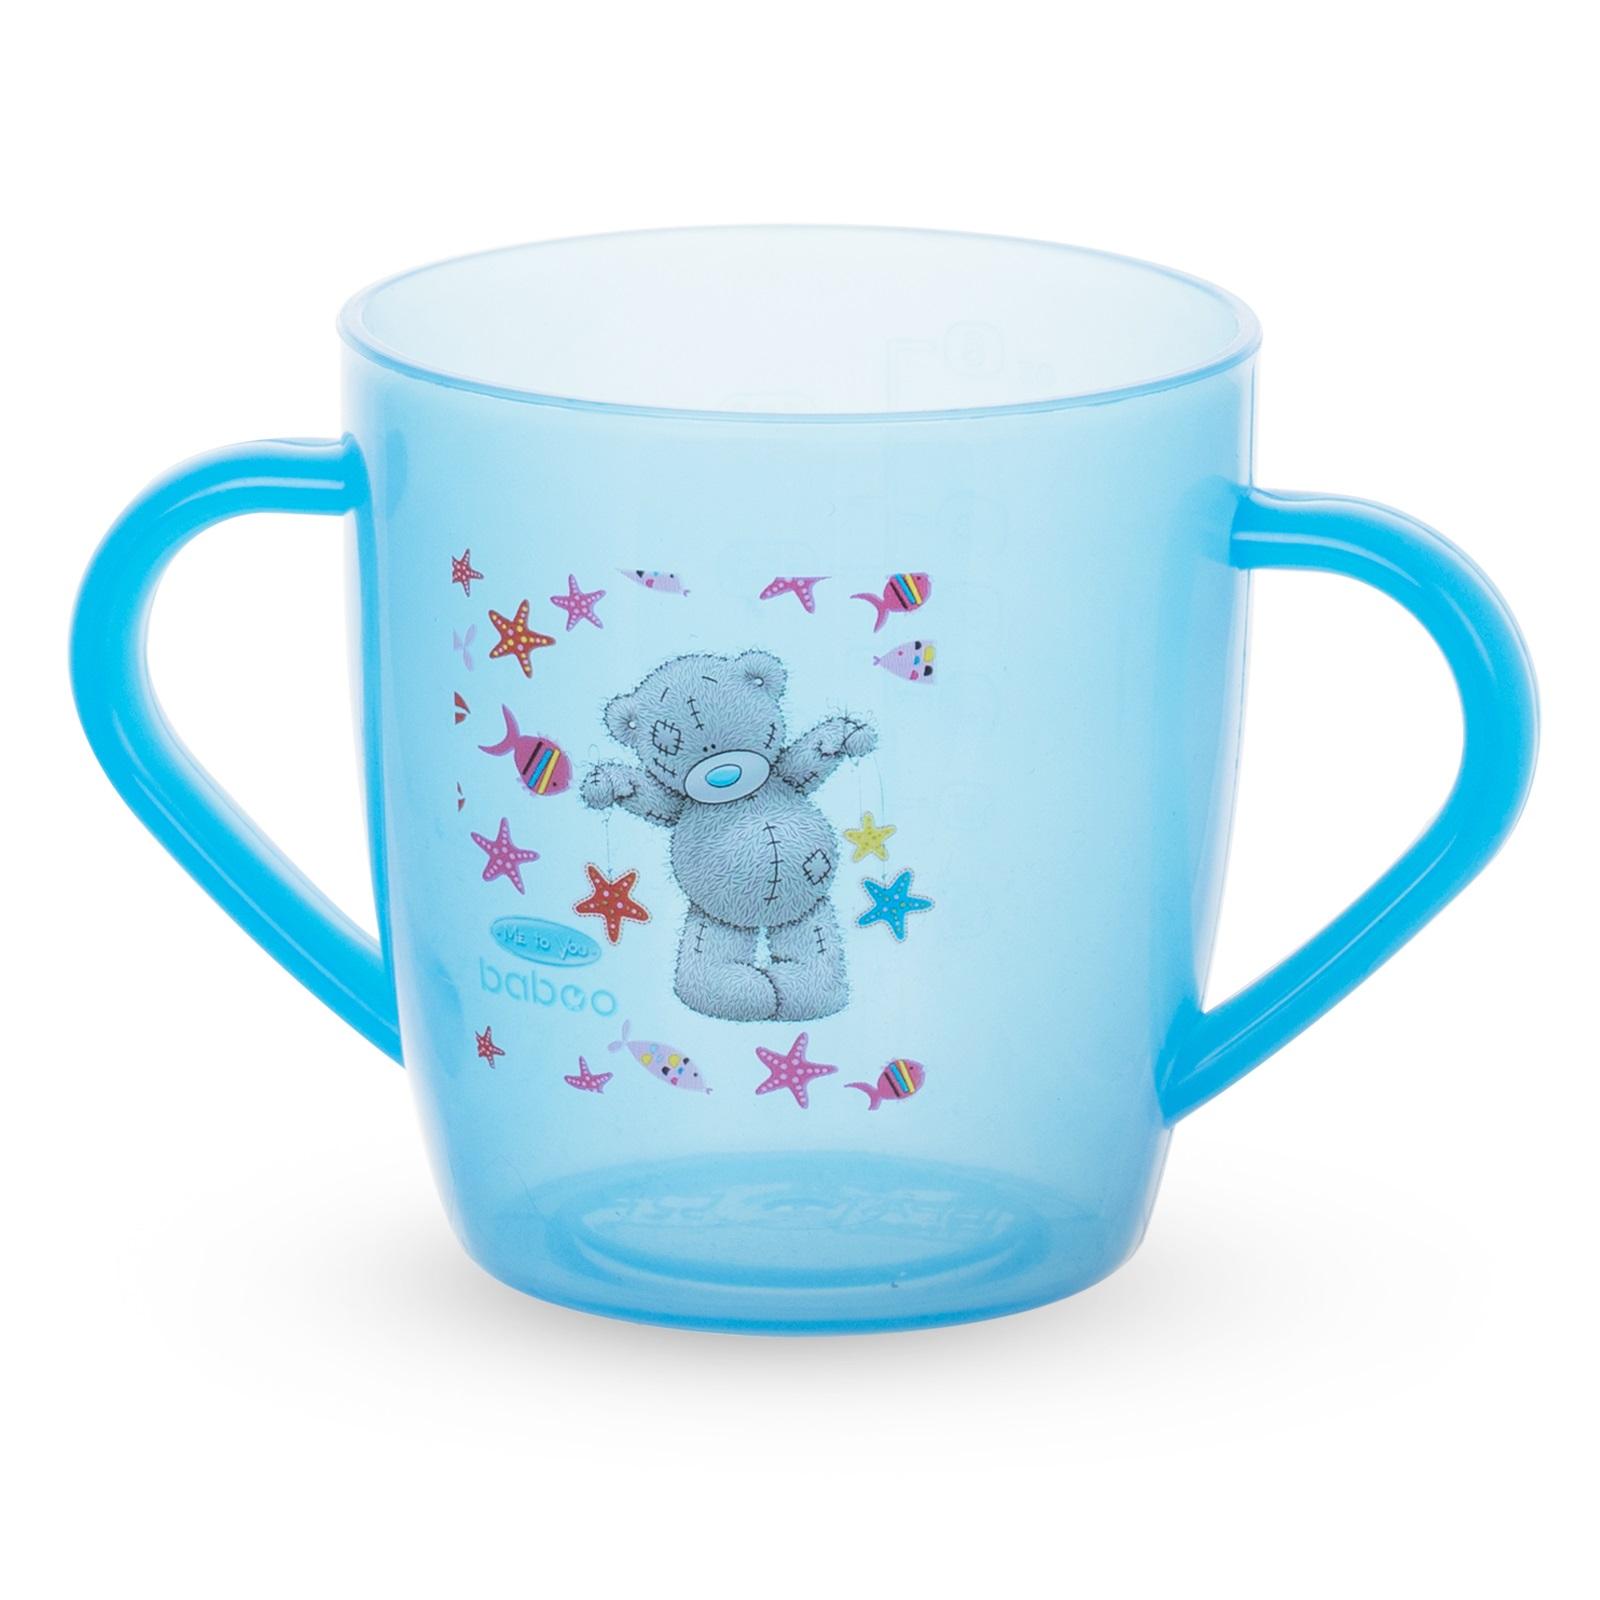 Купить Чашка с ручками Baboo Me to You, 200мл, AVENT Philips, Нидерланды, Голубой